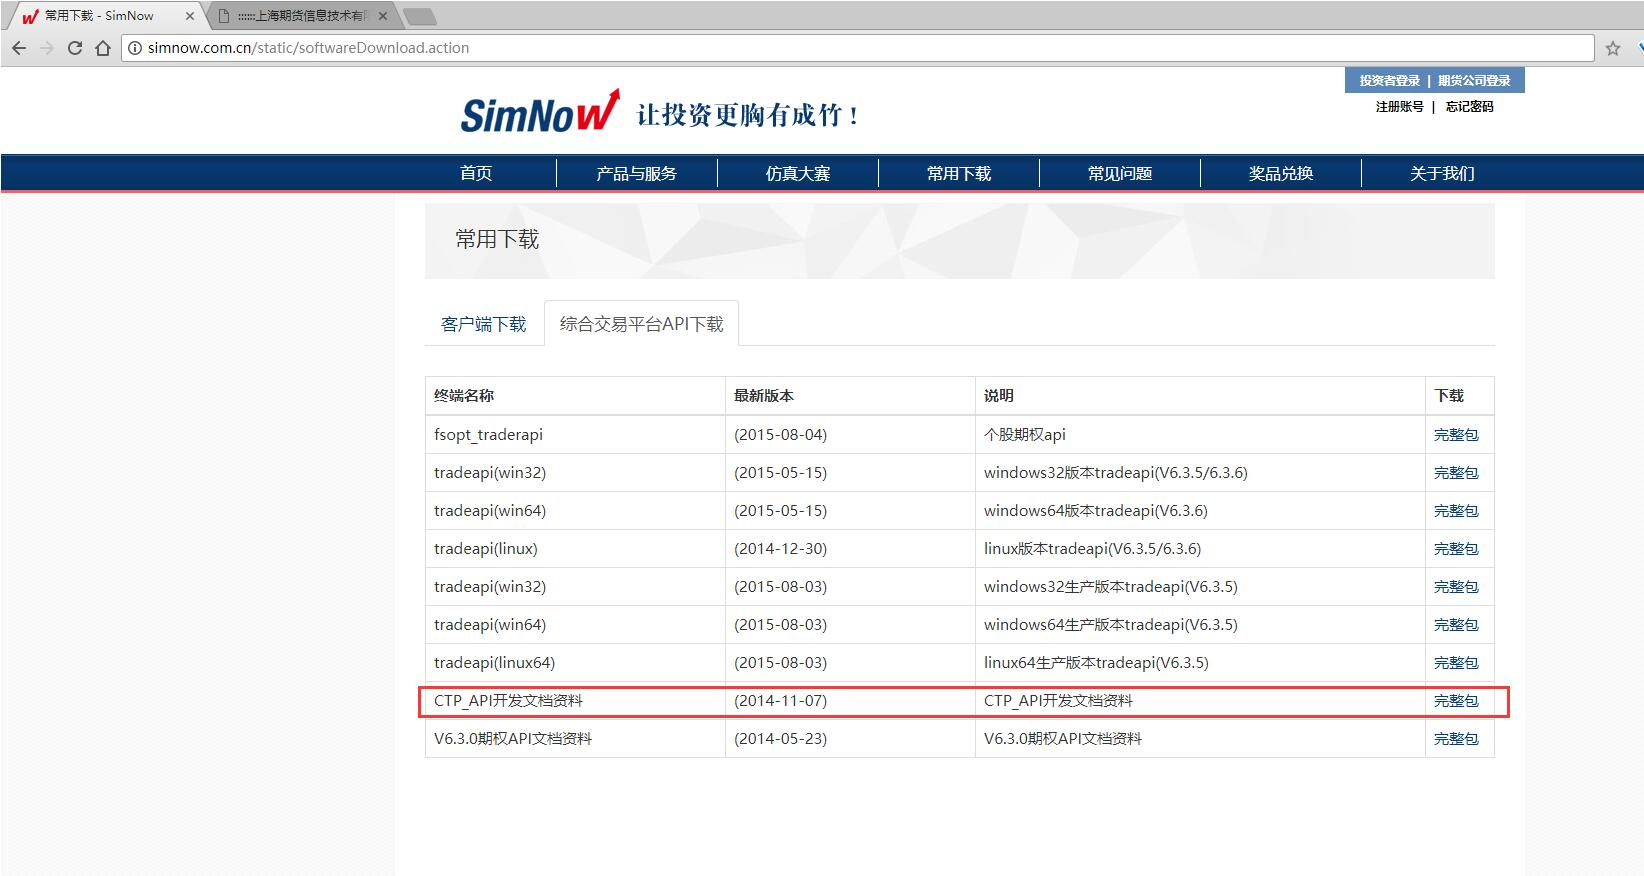 simnow_file